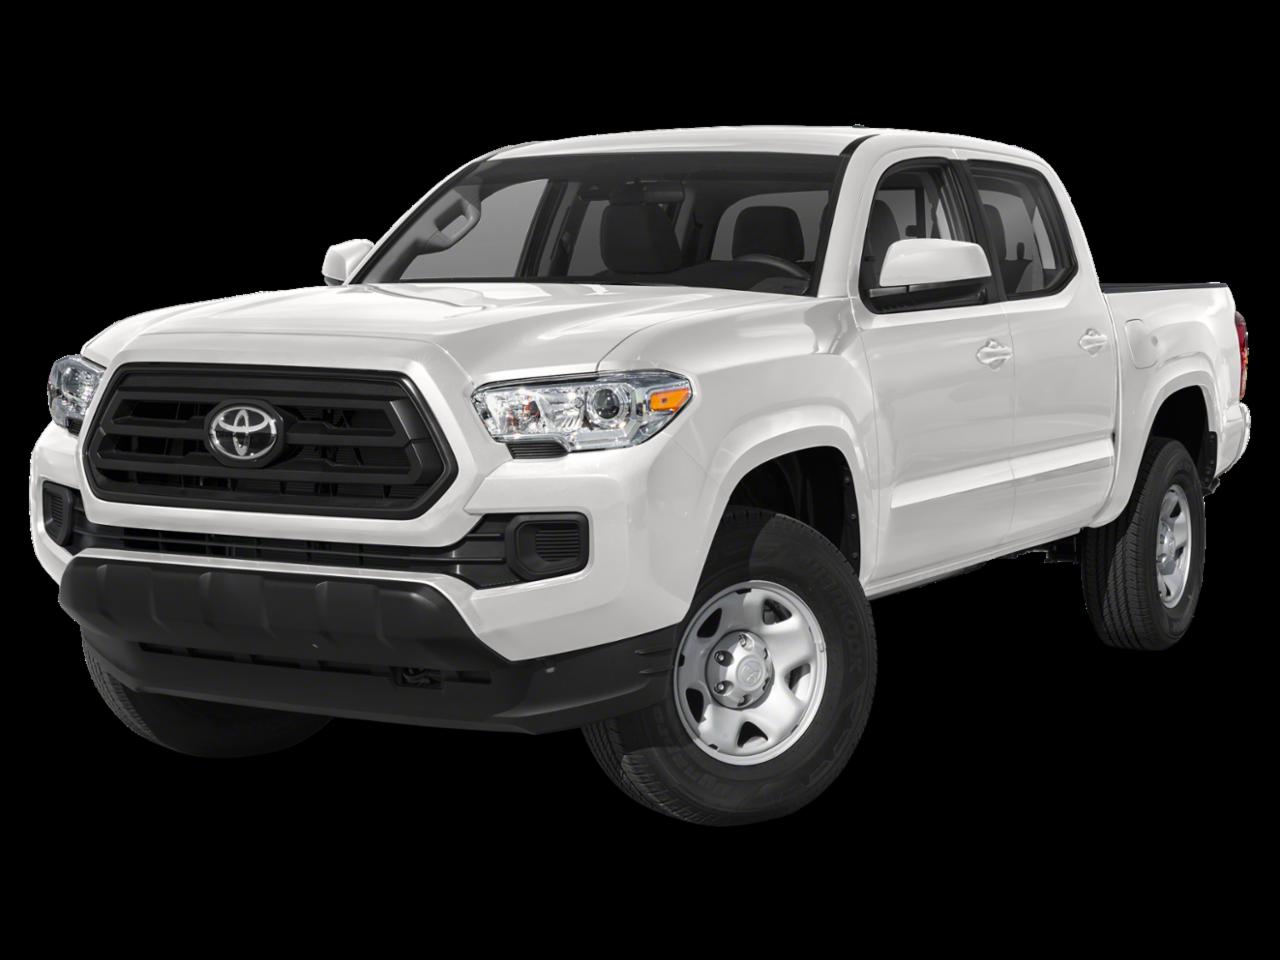 Toyota 2020 Tacoma 2WD Limited